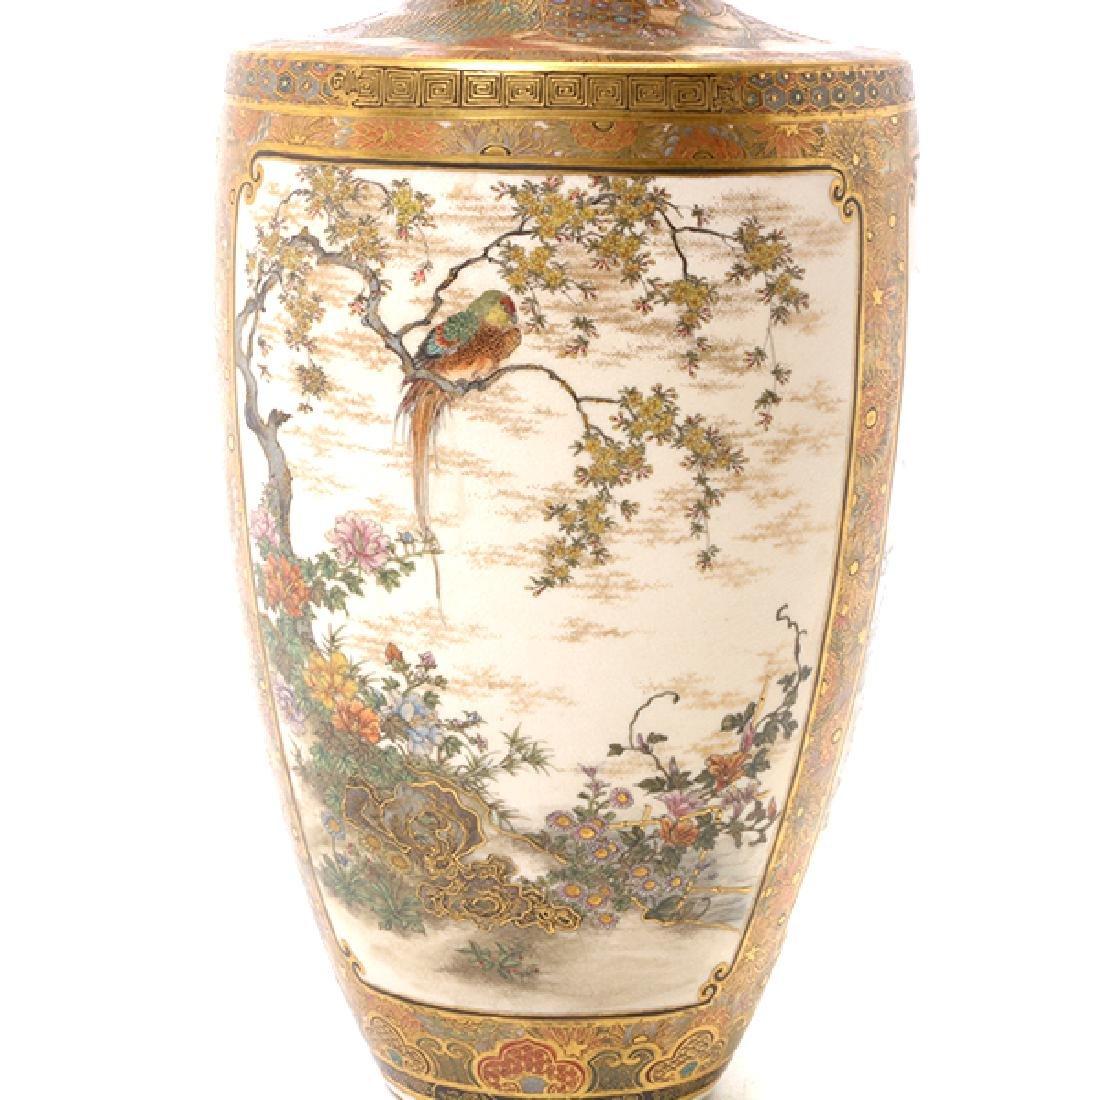 A Pair of Satsuma Vases By Okamoto Ryozan, Meiji Period - 7